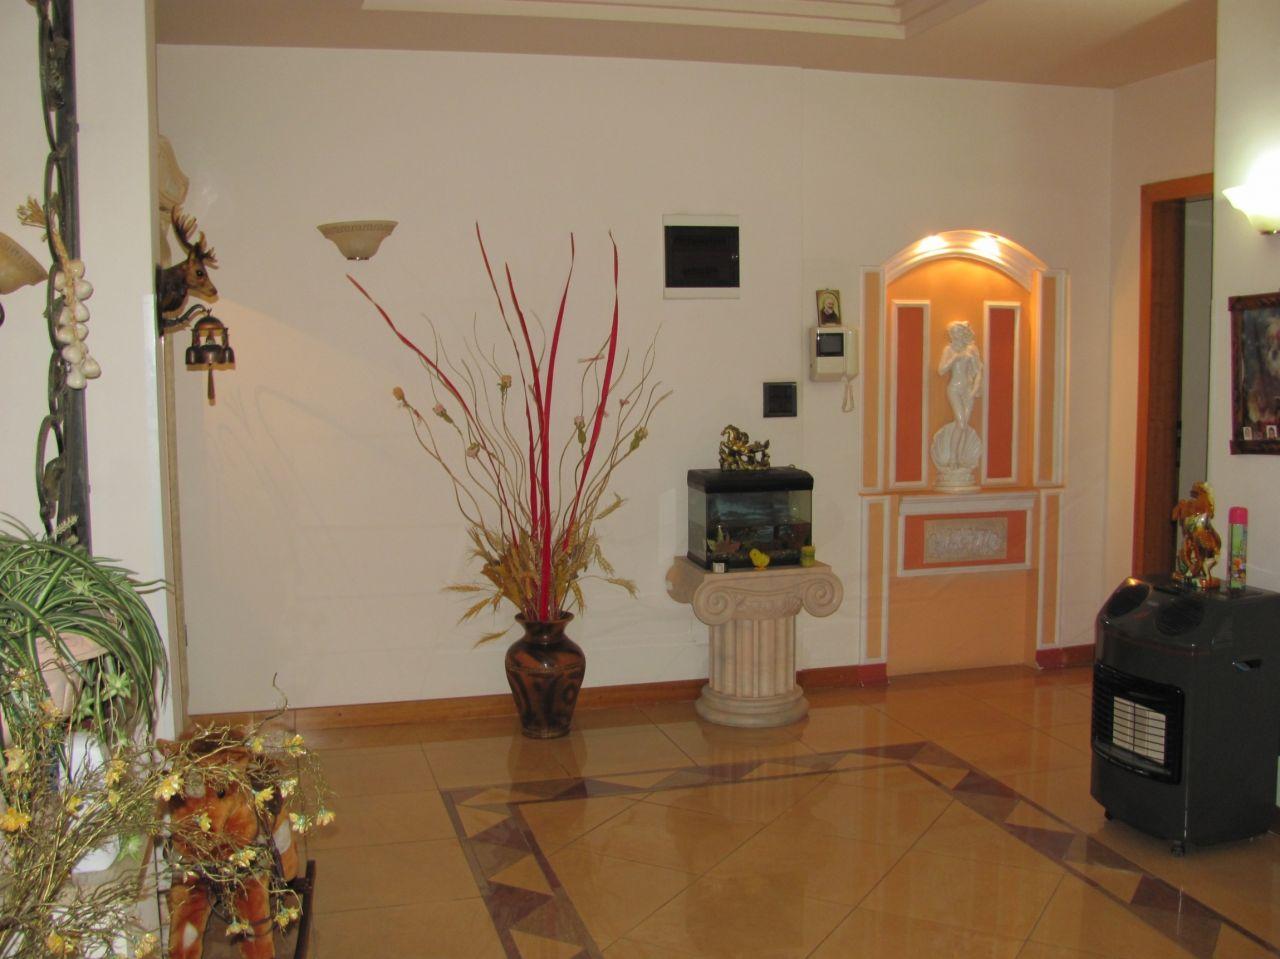 Real Estate in Albania. Apartment in Tirana for sale